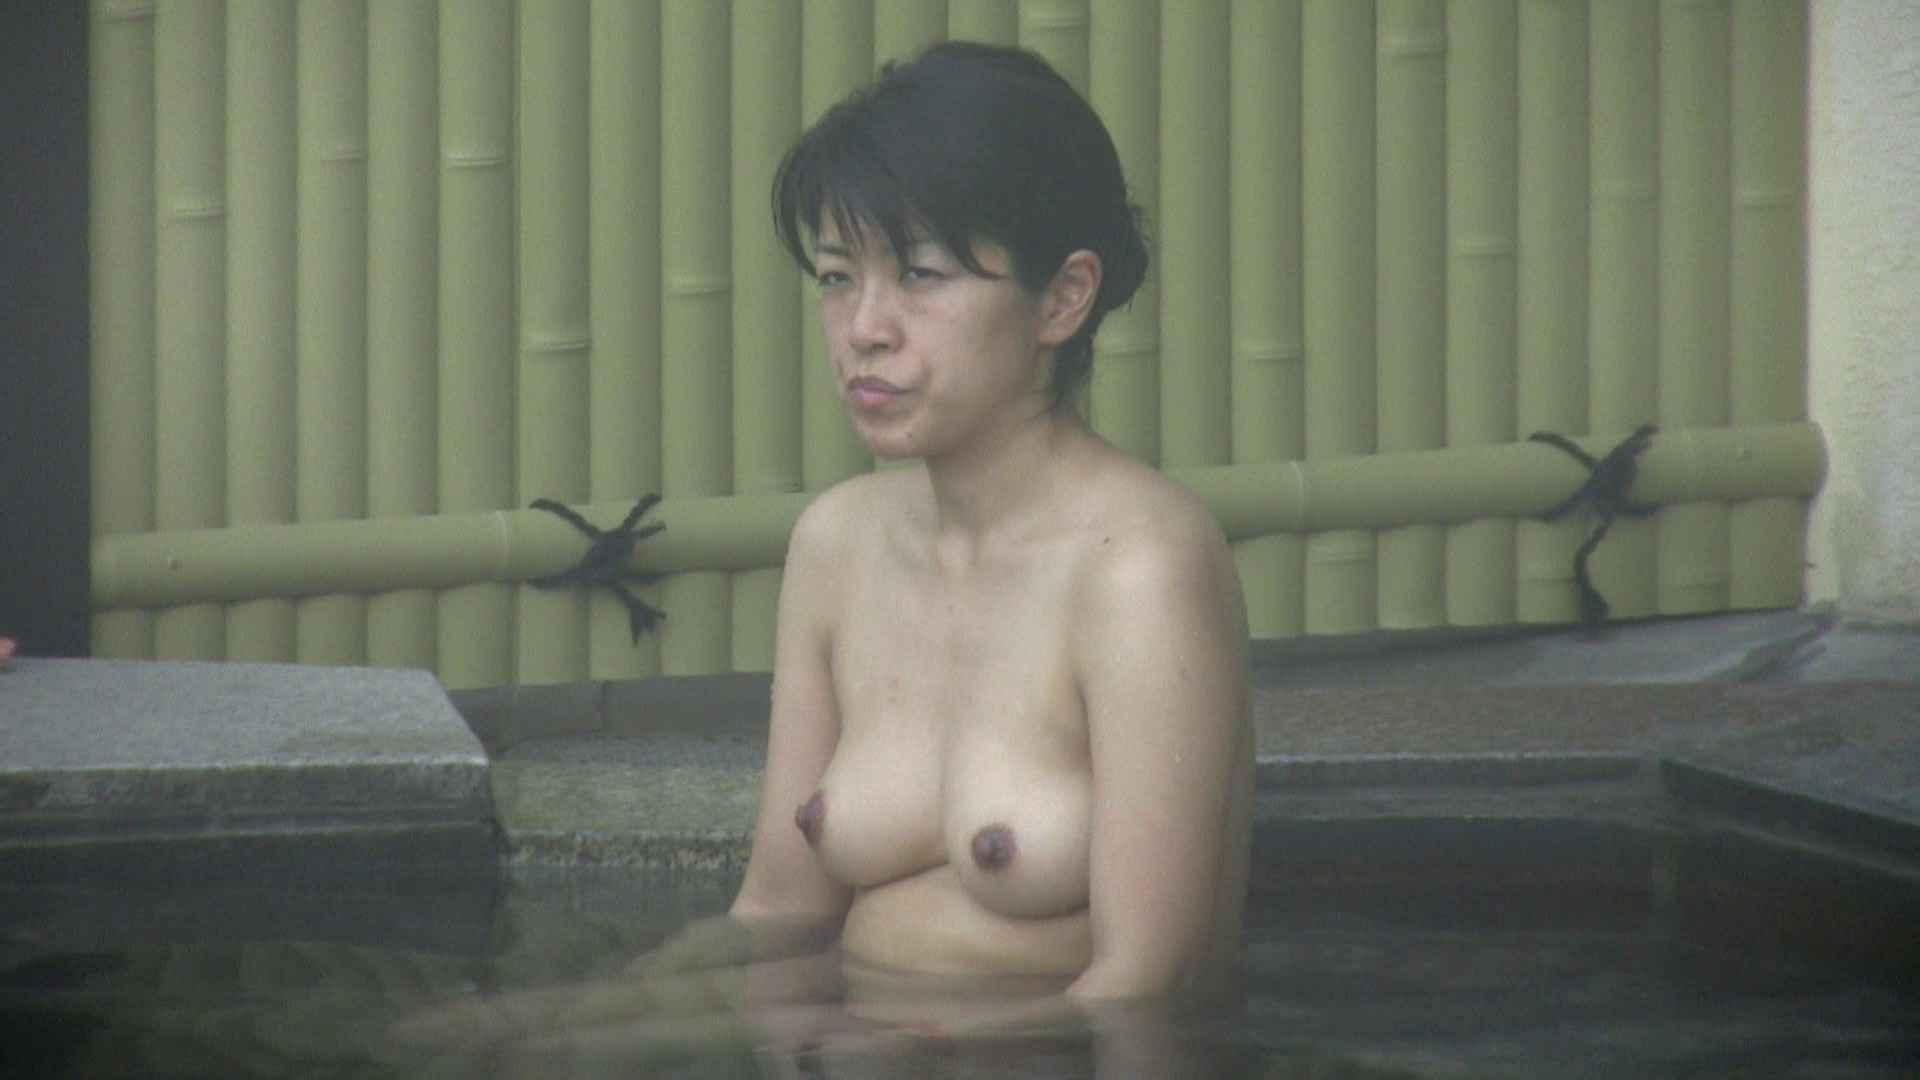 Aquaな露天風呂Vol.585 盗撮   OLセックス  51画像 34